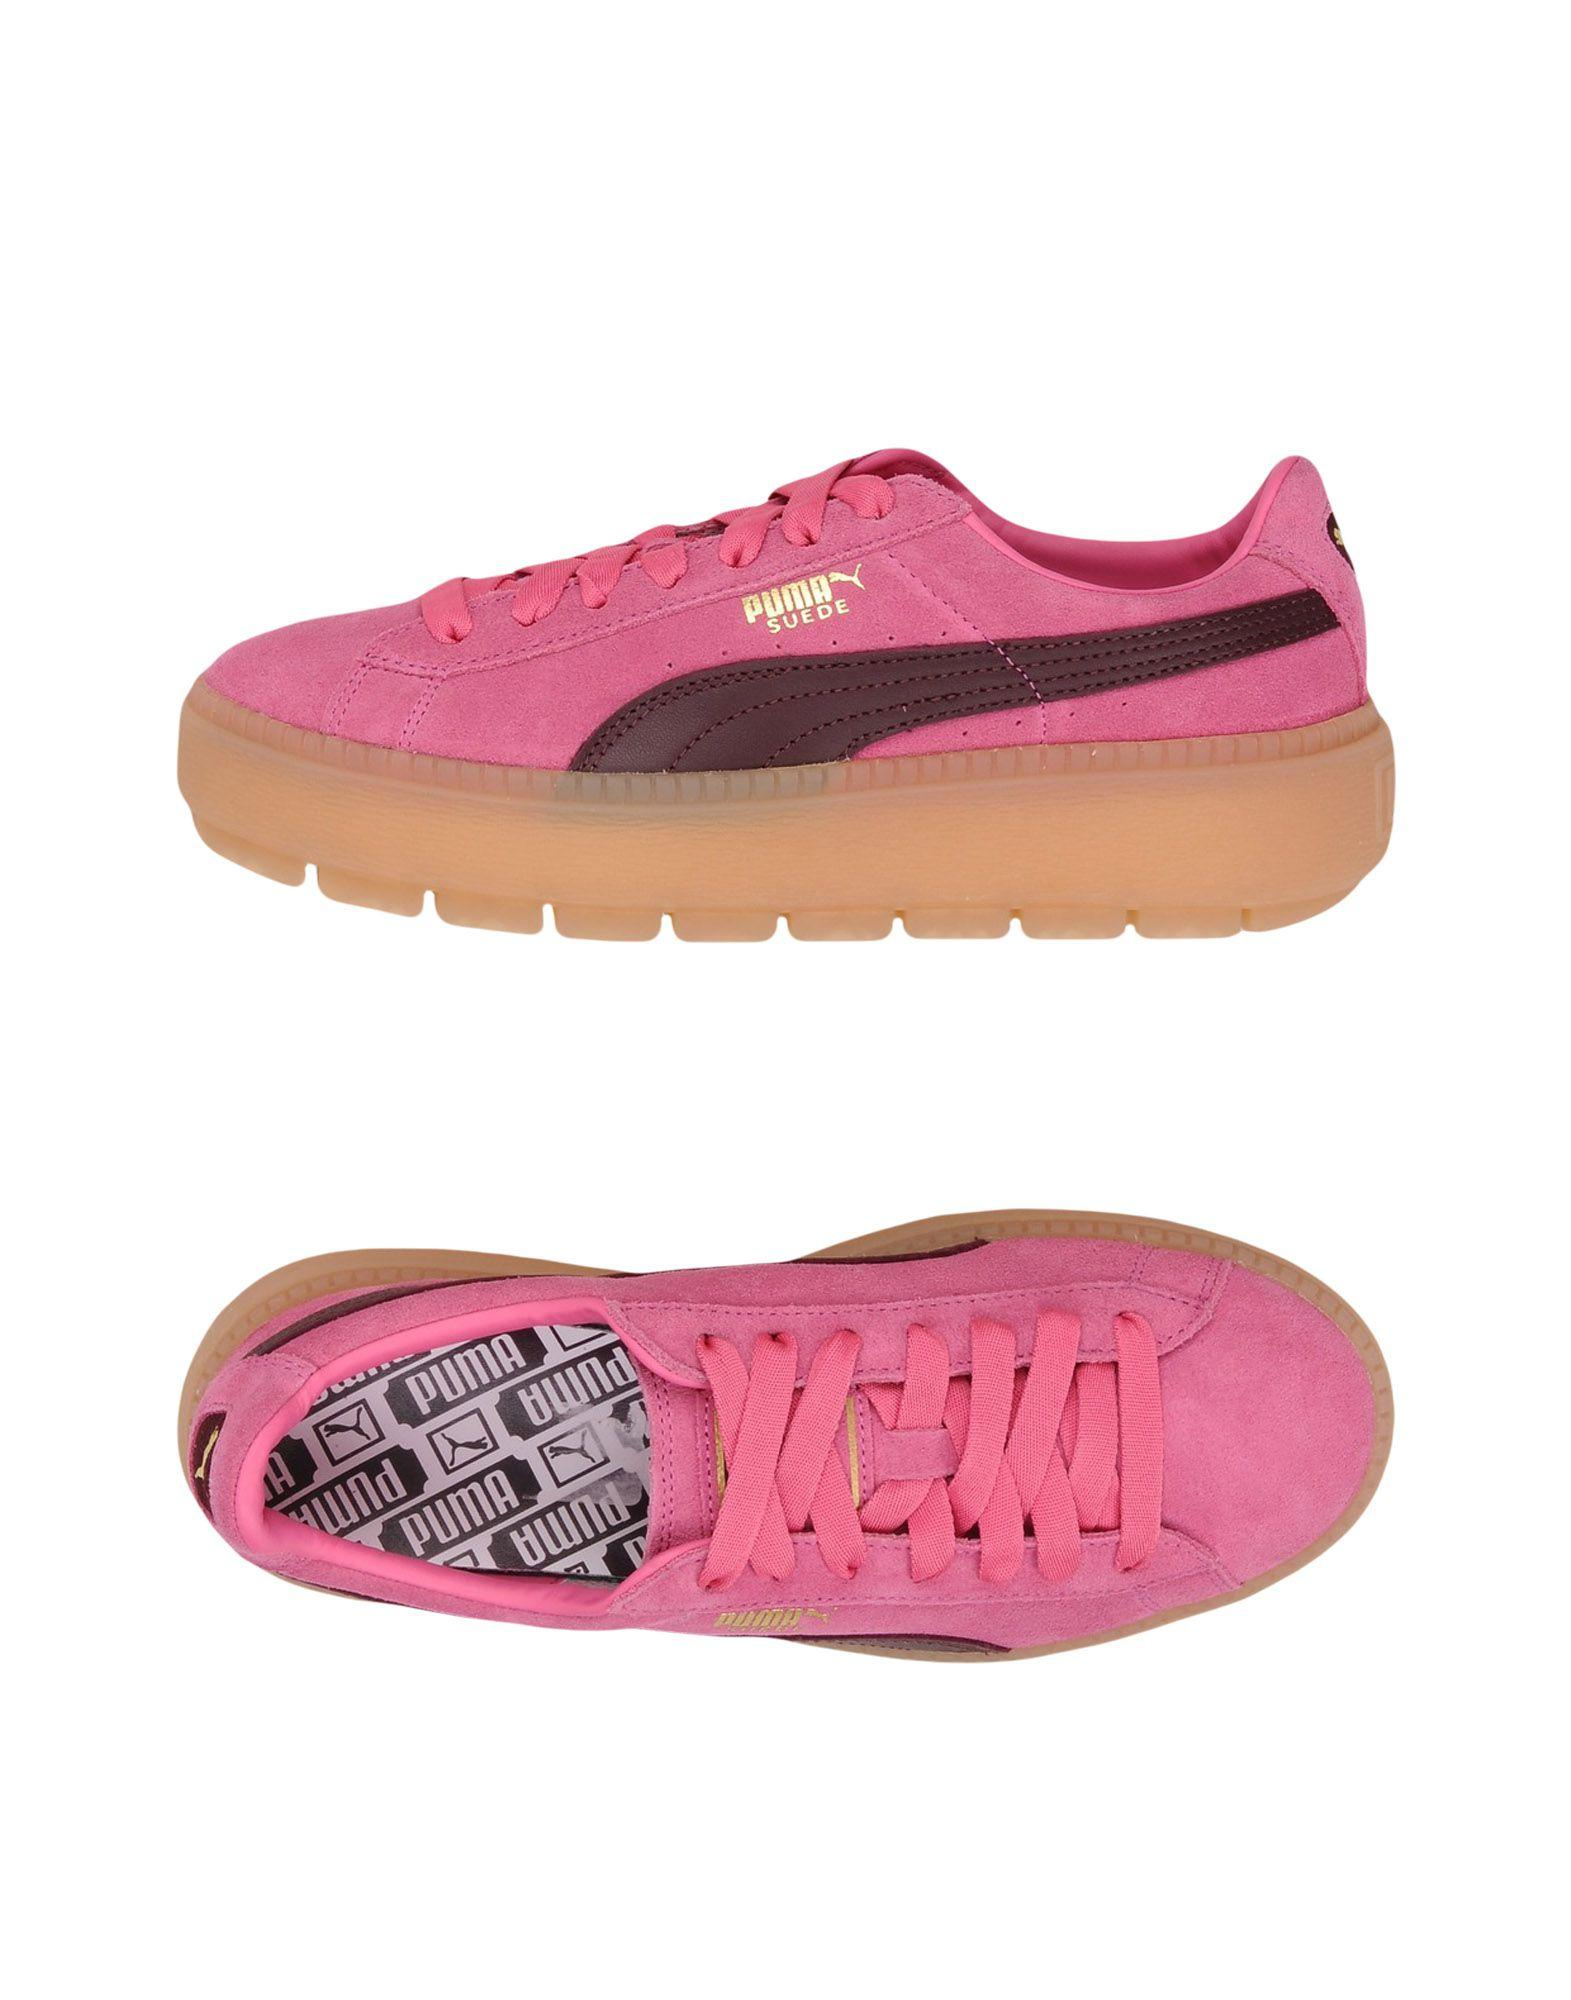 Puma Sneakers In Fuchsia